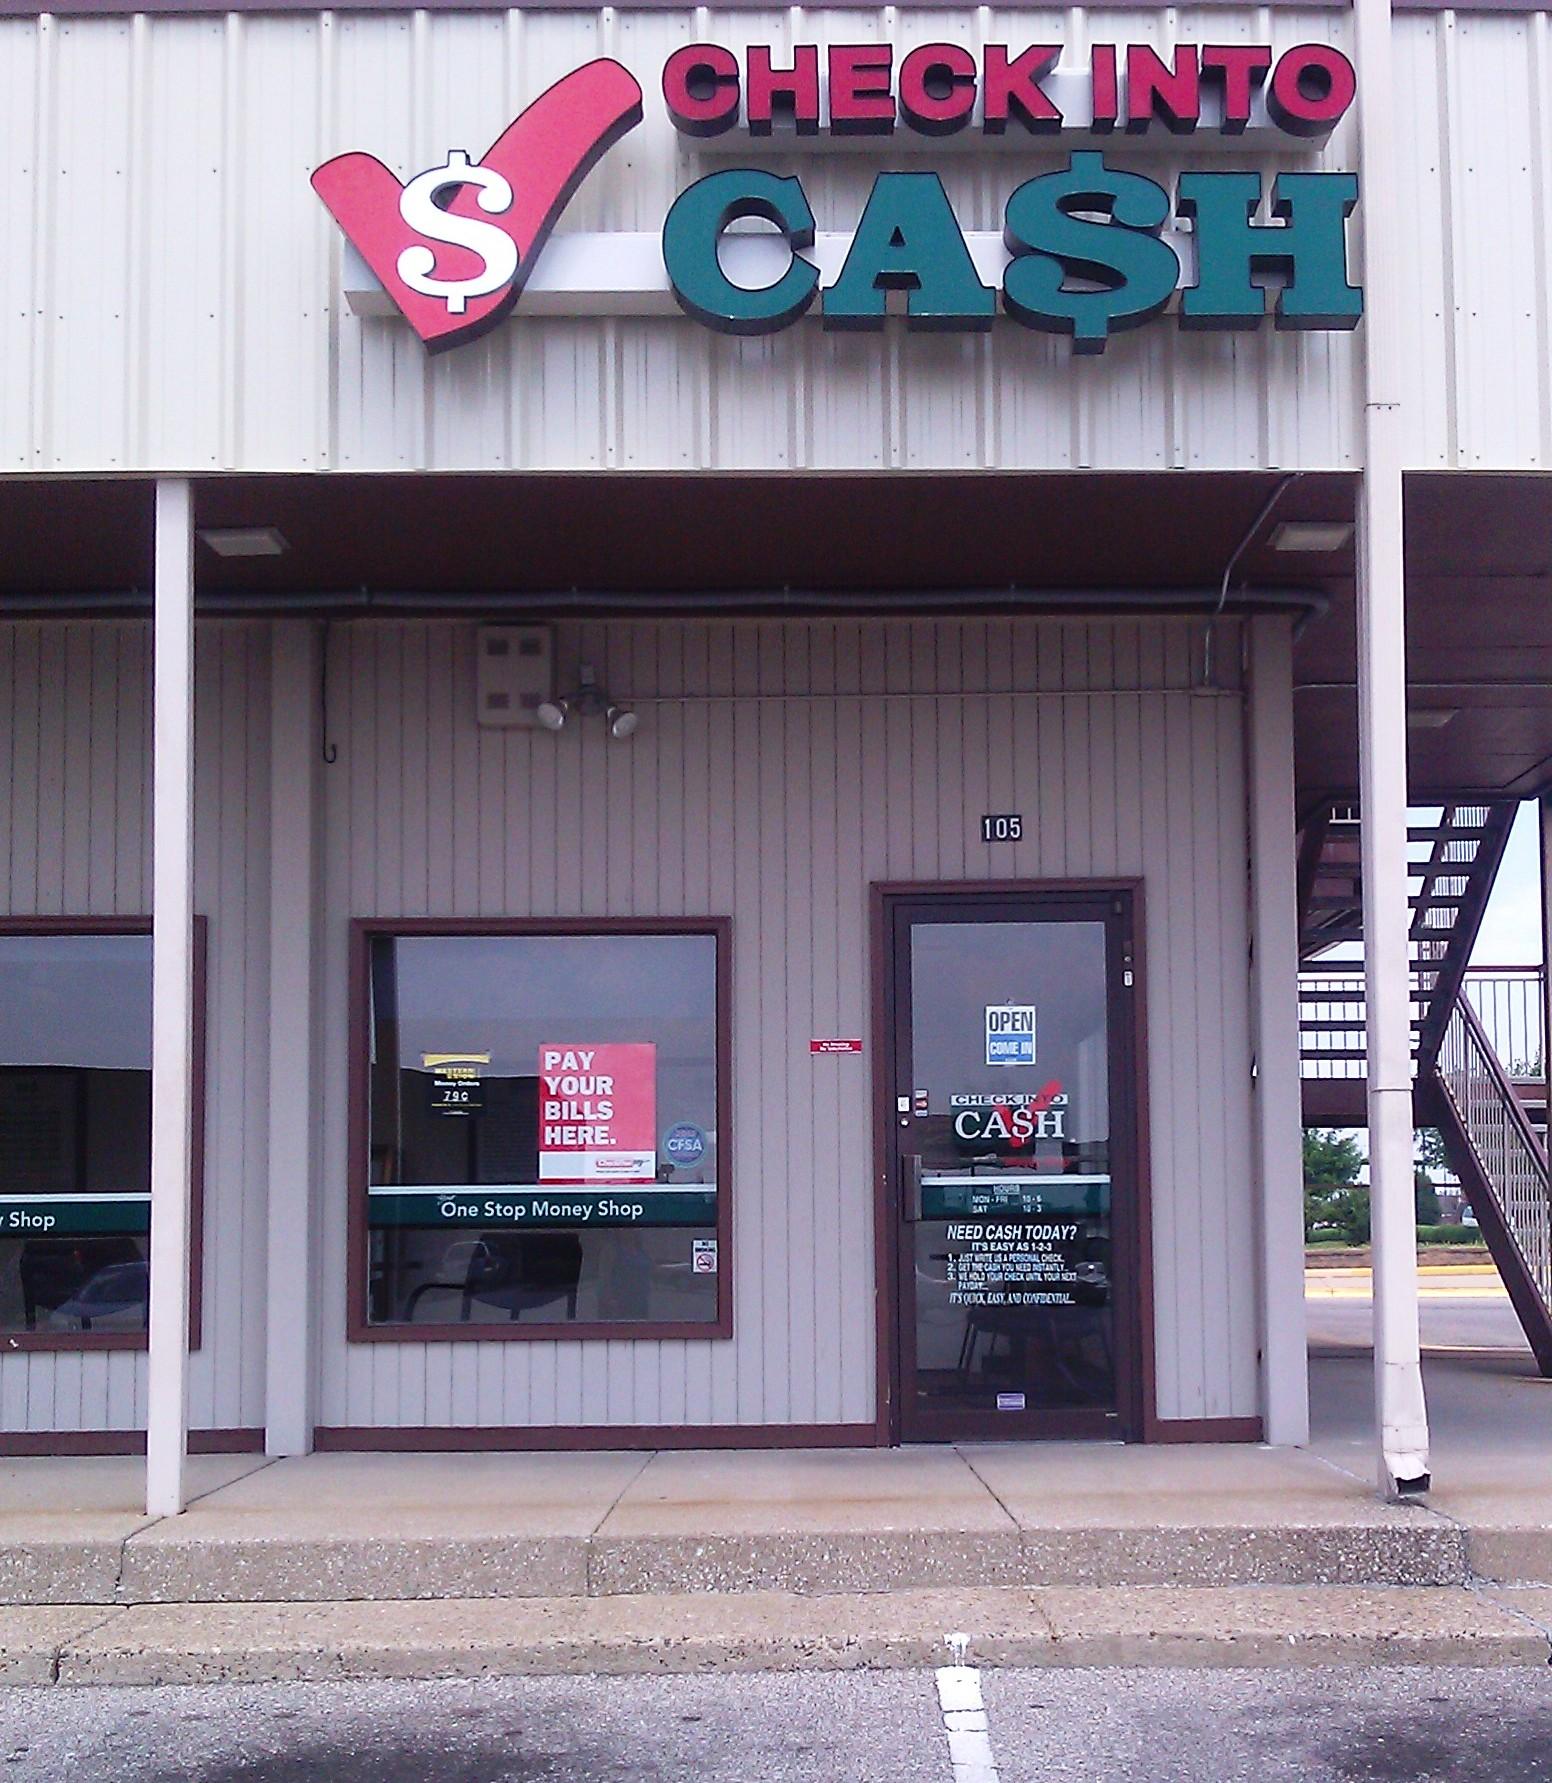 Payday loans cash crusaders image 3